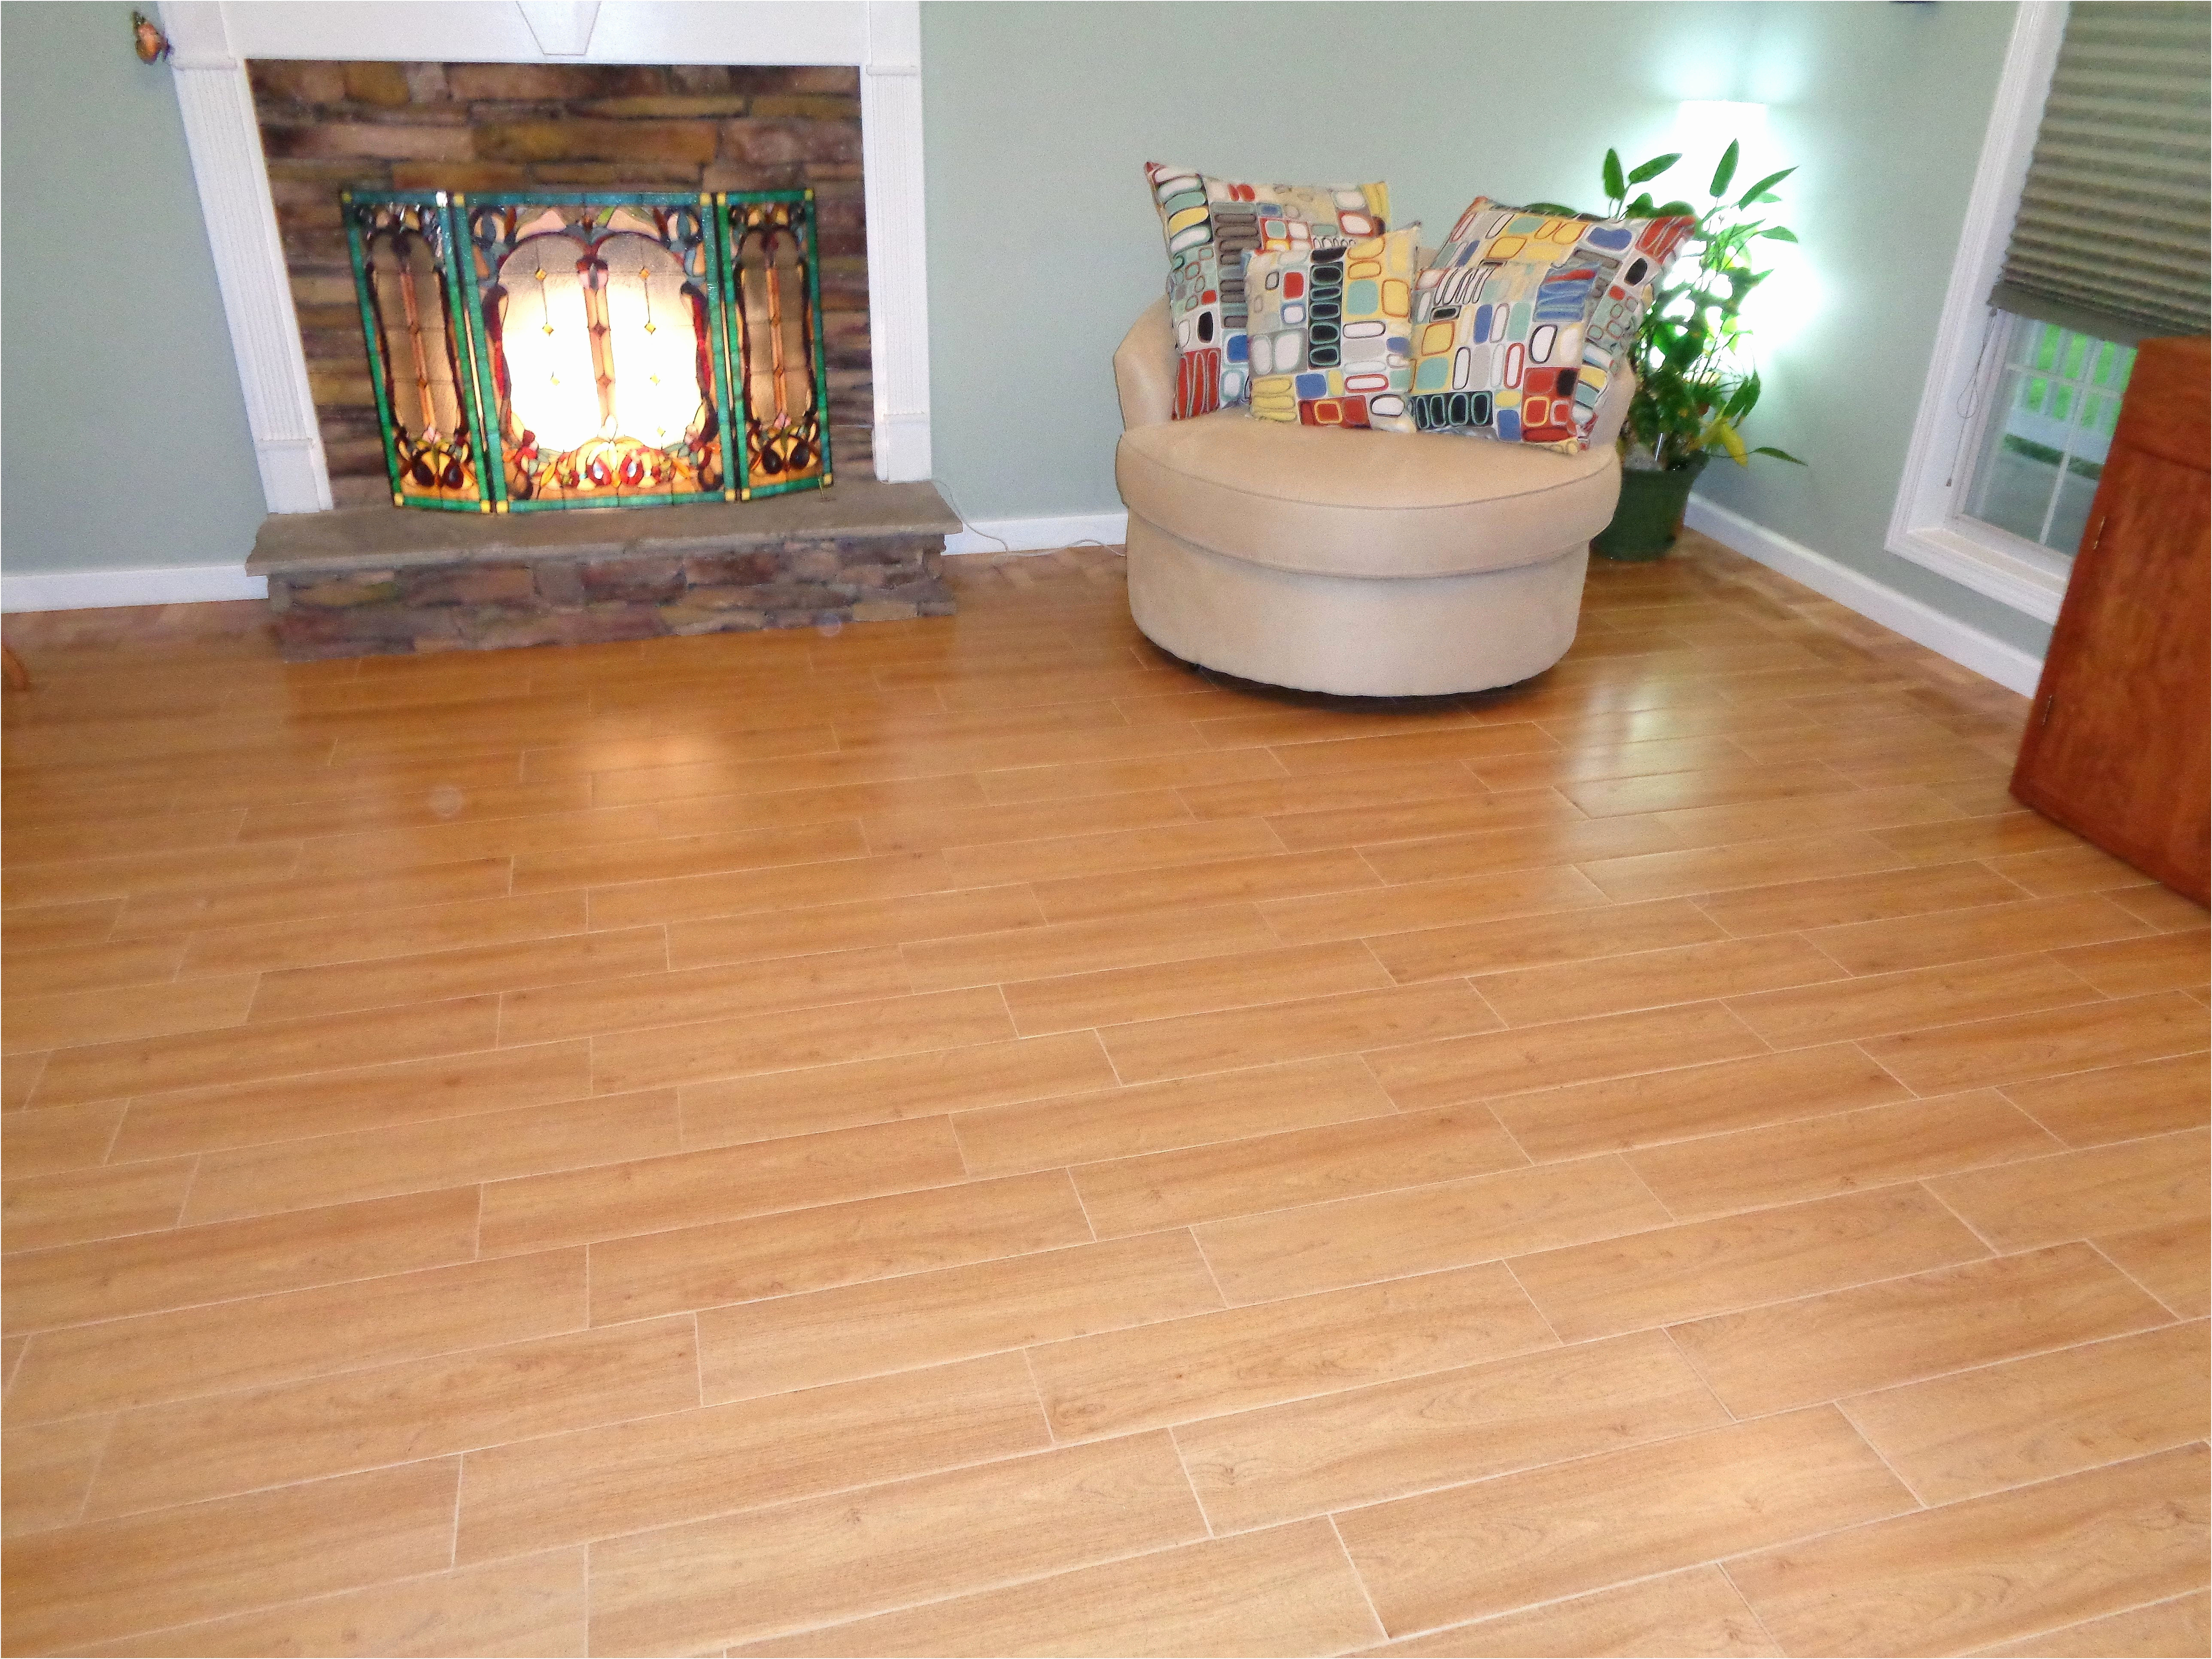 hardwood floor store of charming bathroom wood floor with designer laminate flooring unique regarding charming bathroom wood floor with designer laminate flooring unique woodfloor warehouse 0d awesome